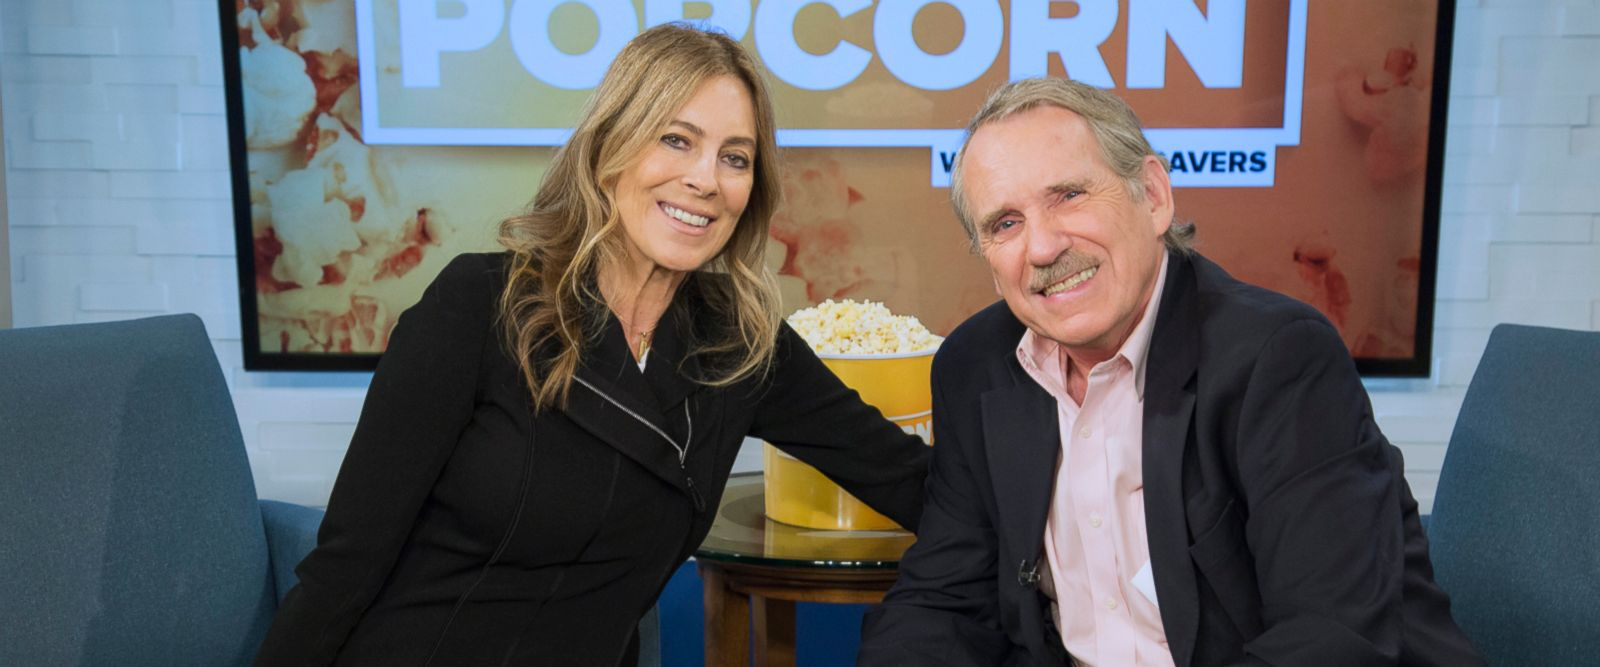 VIDEO: Oscar-winning director Kathryn Bigelow on the making of her new film 'Detroit'